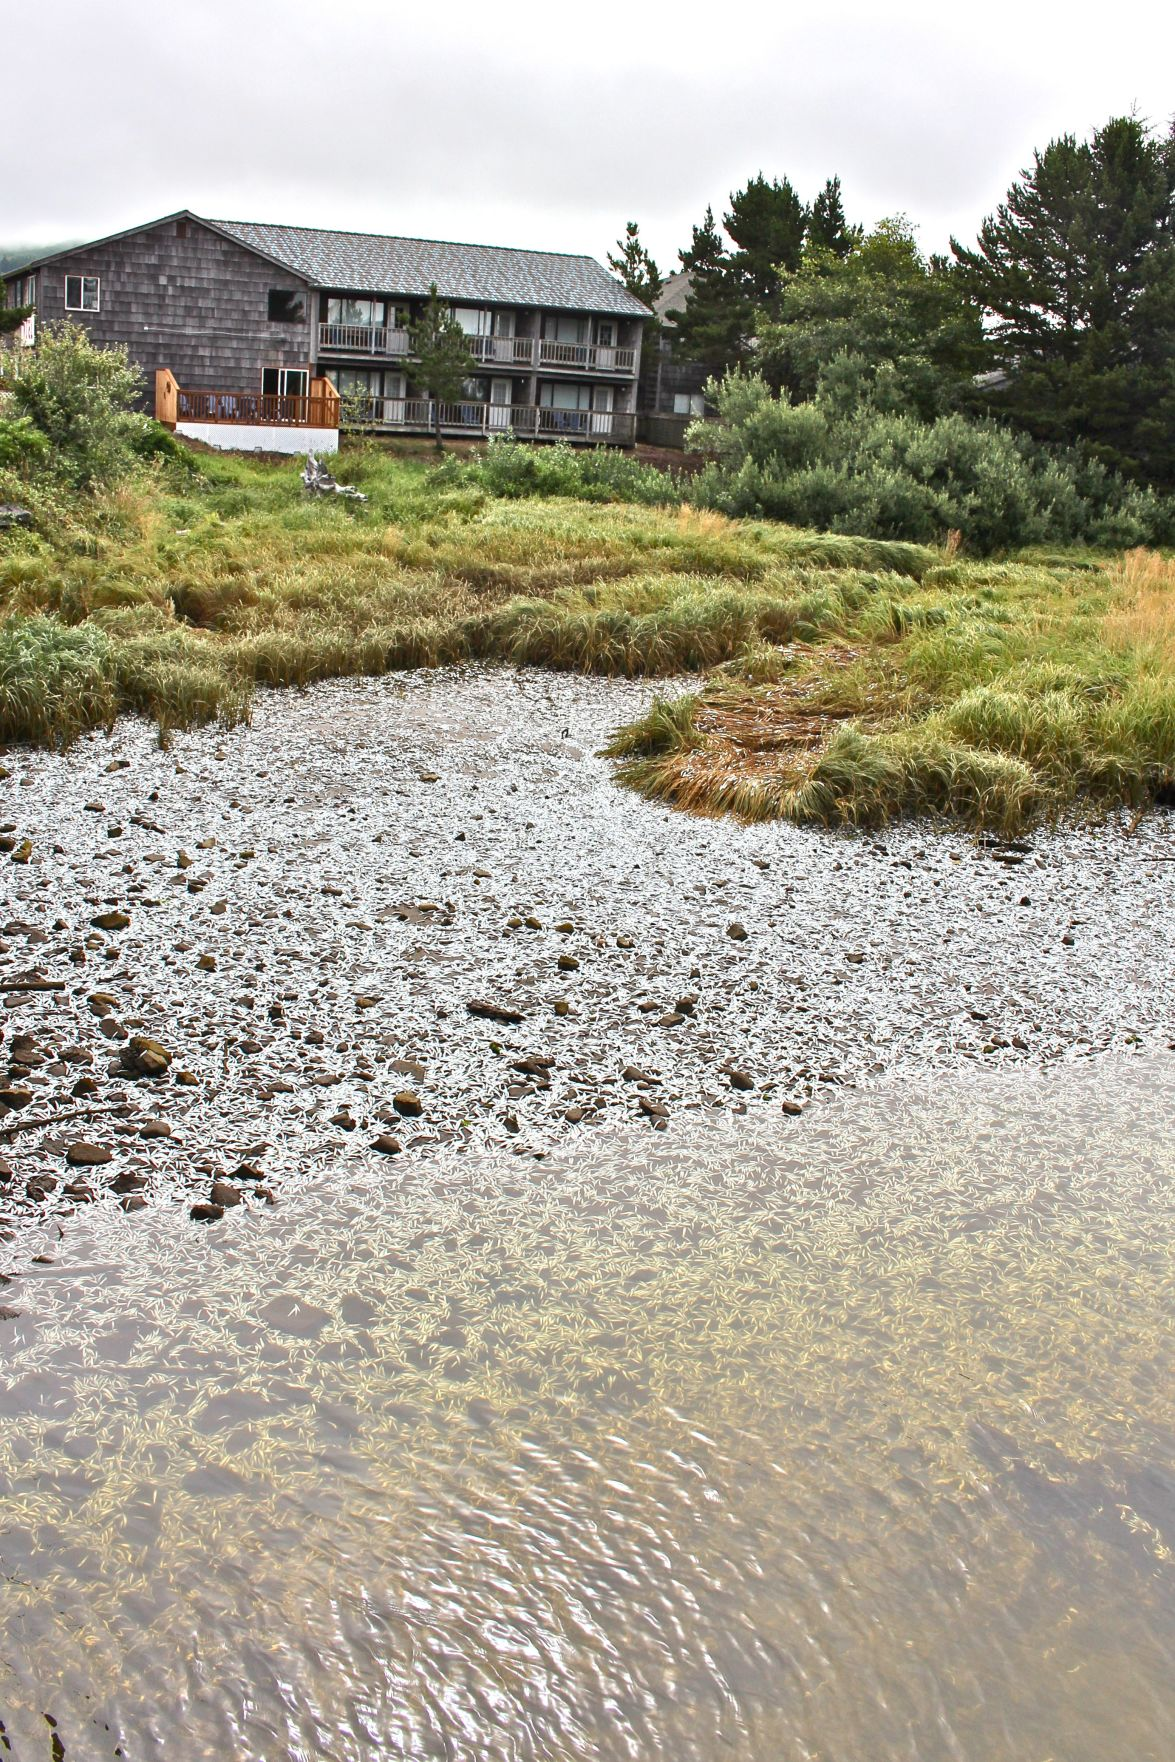 Dead anchovies blanket Necanicum River bank